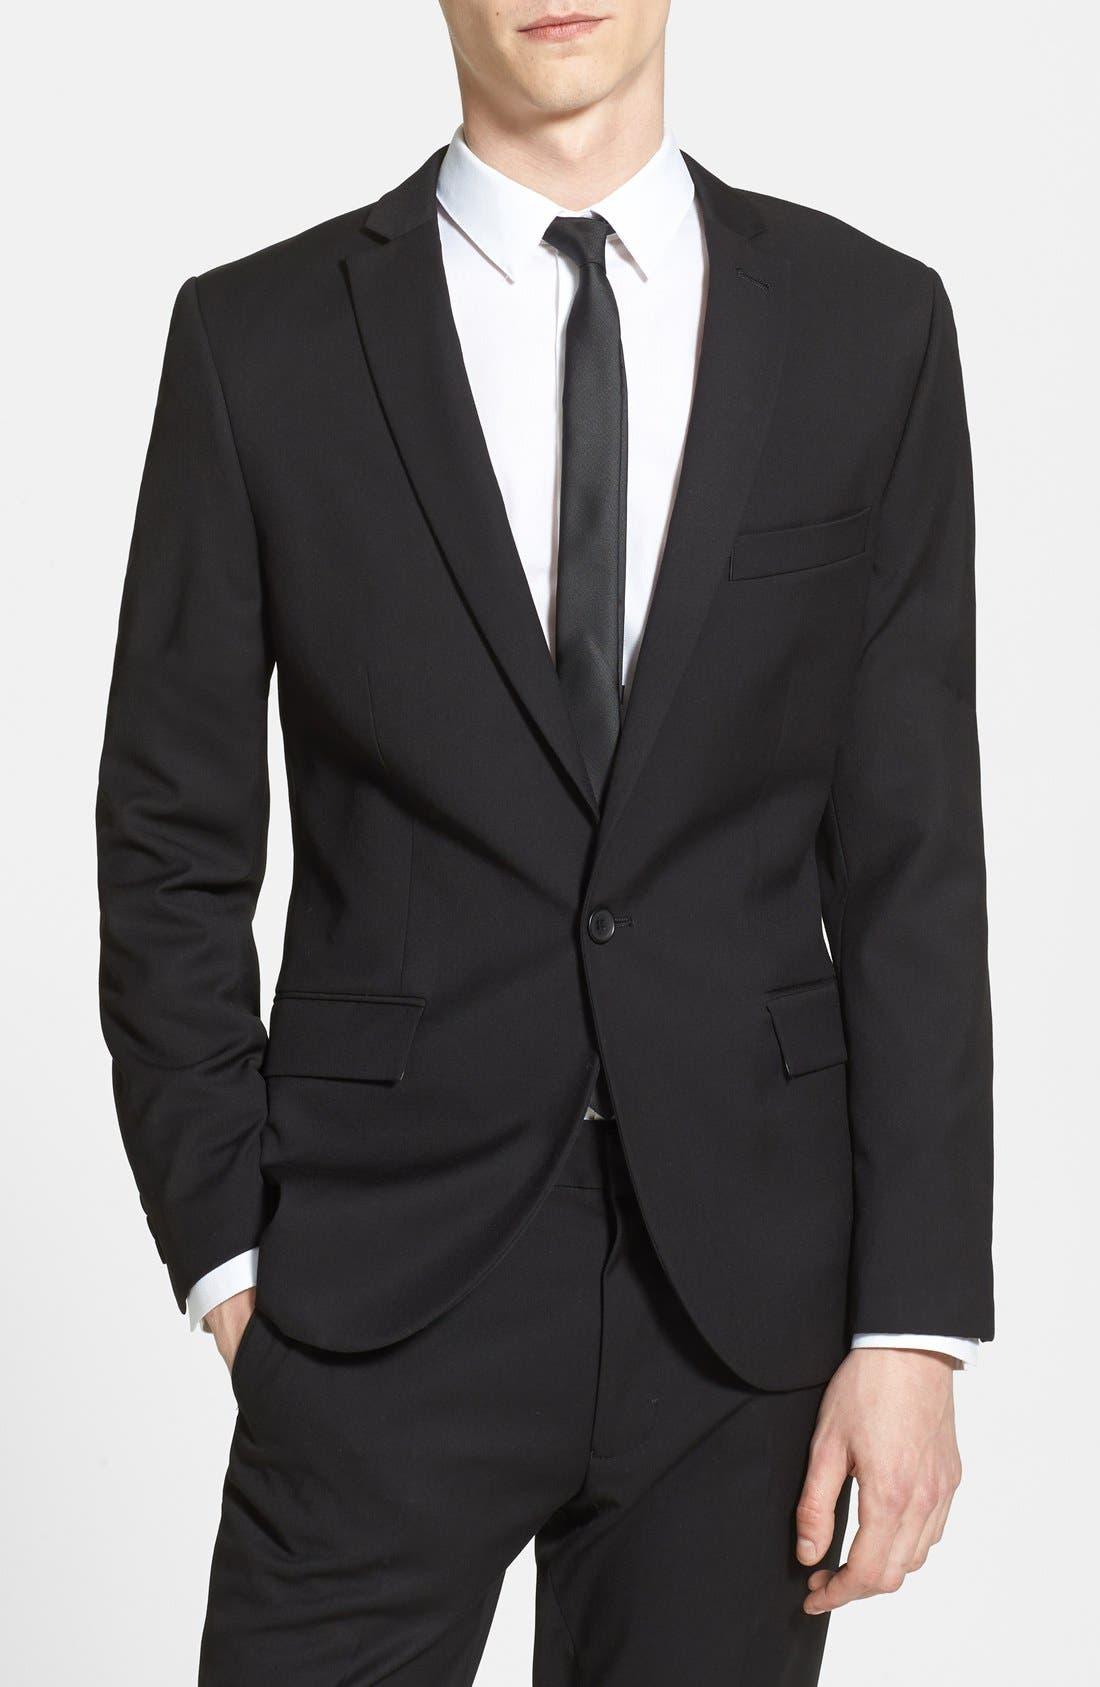 Alternate Image 1 Selected - Topman Black Textured Skinny Fit Suit Jacket